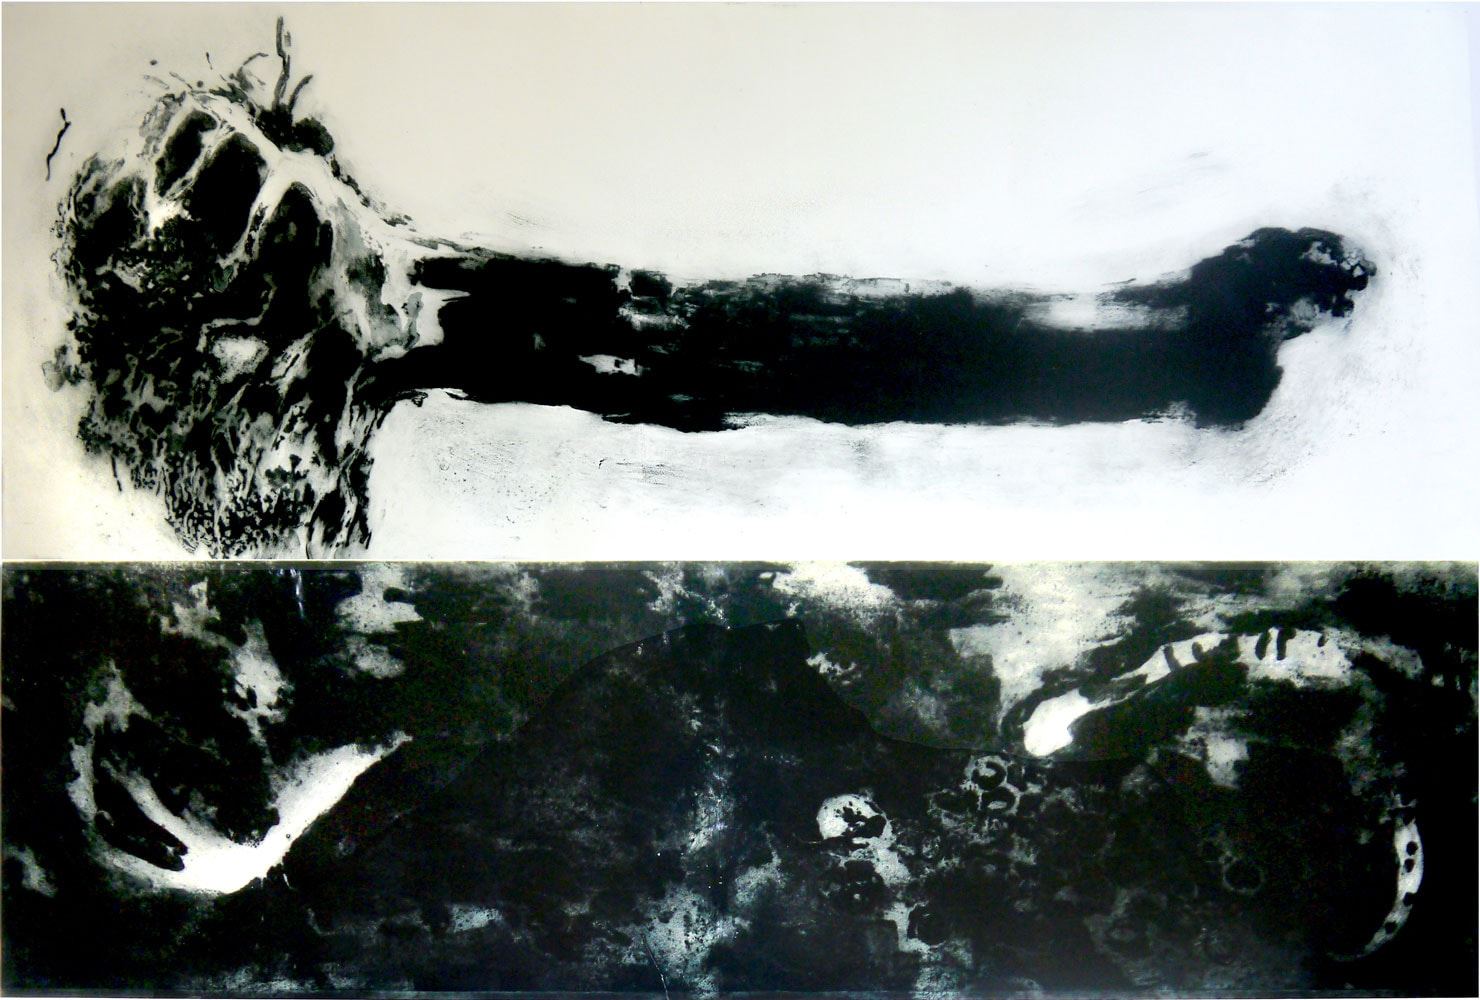 Ontworteld (bestrating), 2014, carborundum print 113 x 170 cm